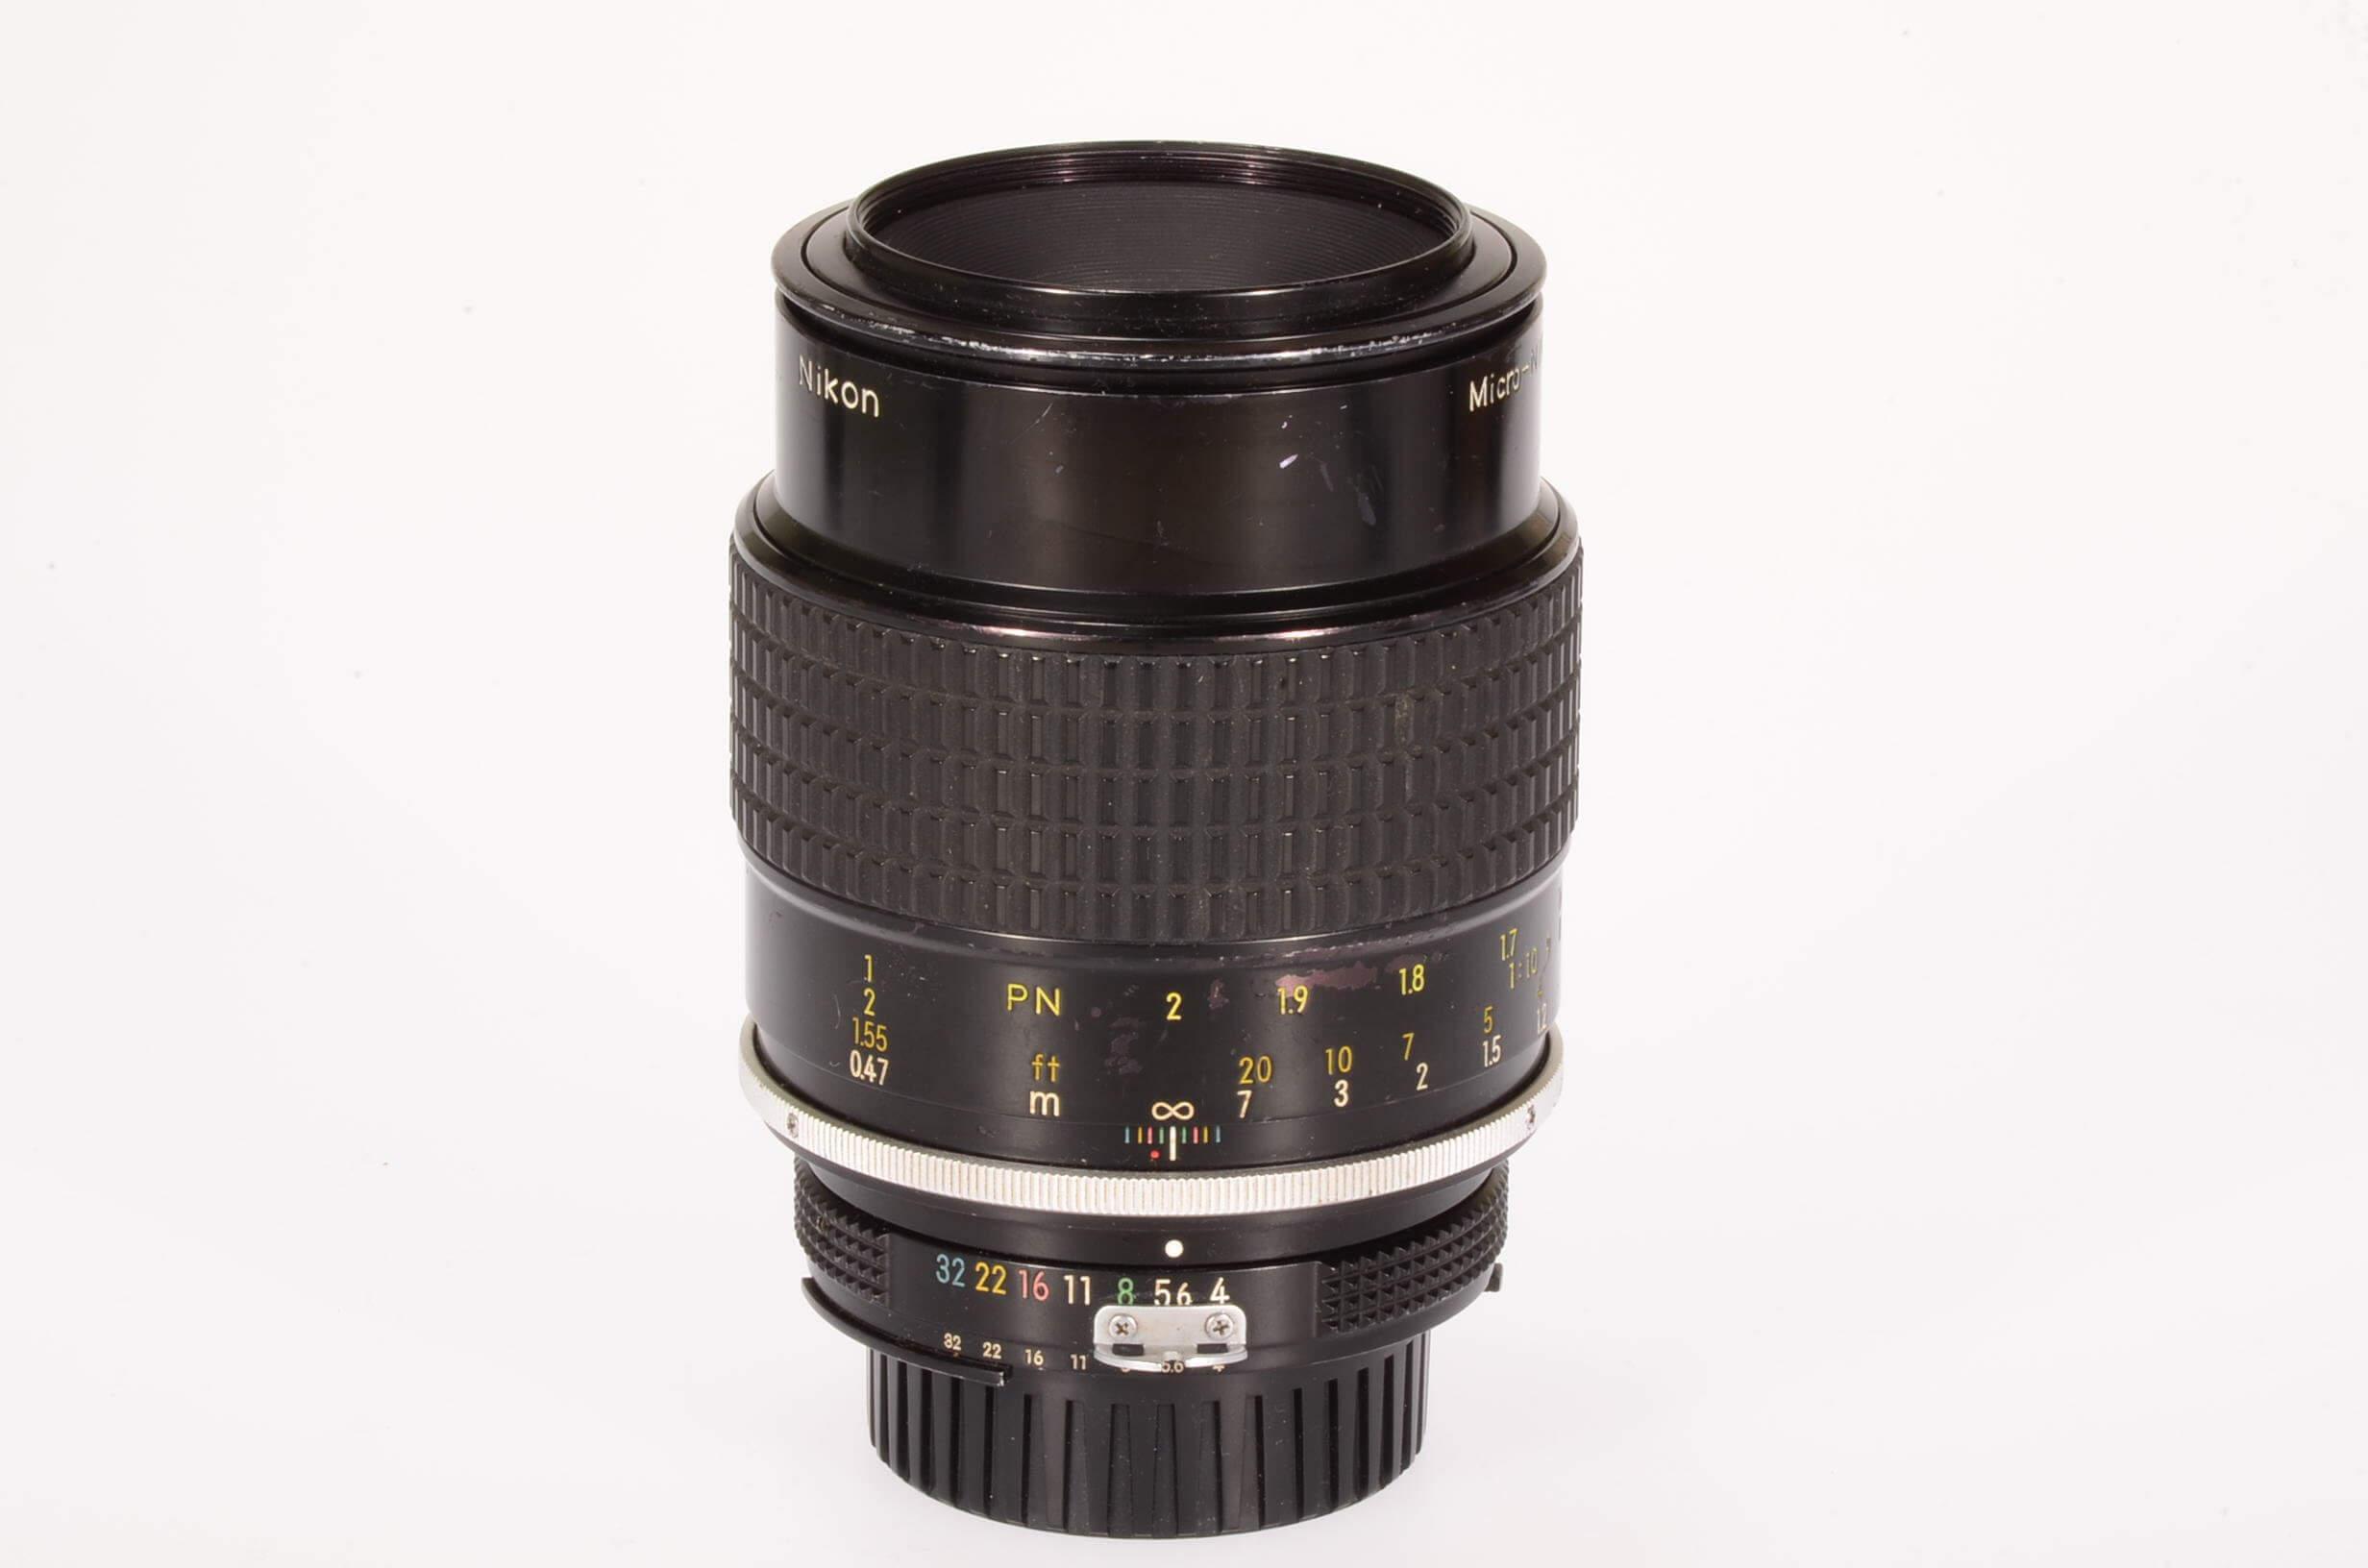 Nikon 105mm f4 Micro-Nikkor, AI, serviced